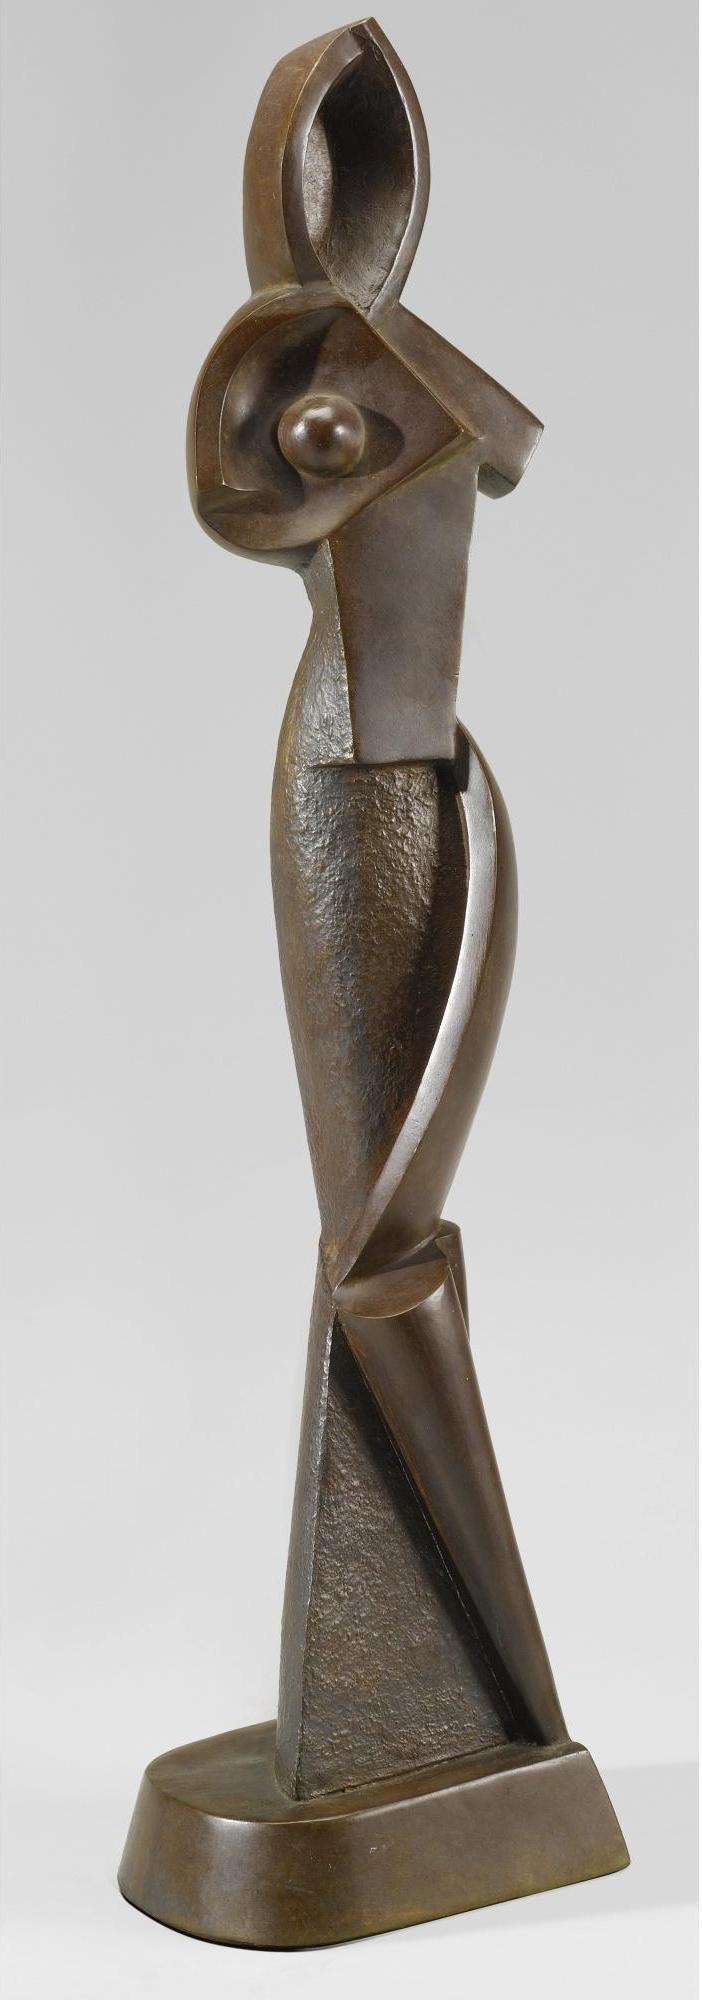 alexander archipenko 1887 1964 geometric statuette 1914 68 9 cm pinterest. Black Bedroom Furniture Sets. Home Design Ideas